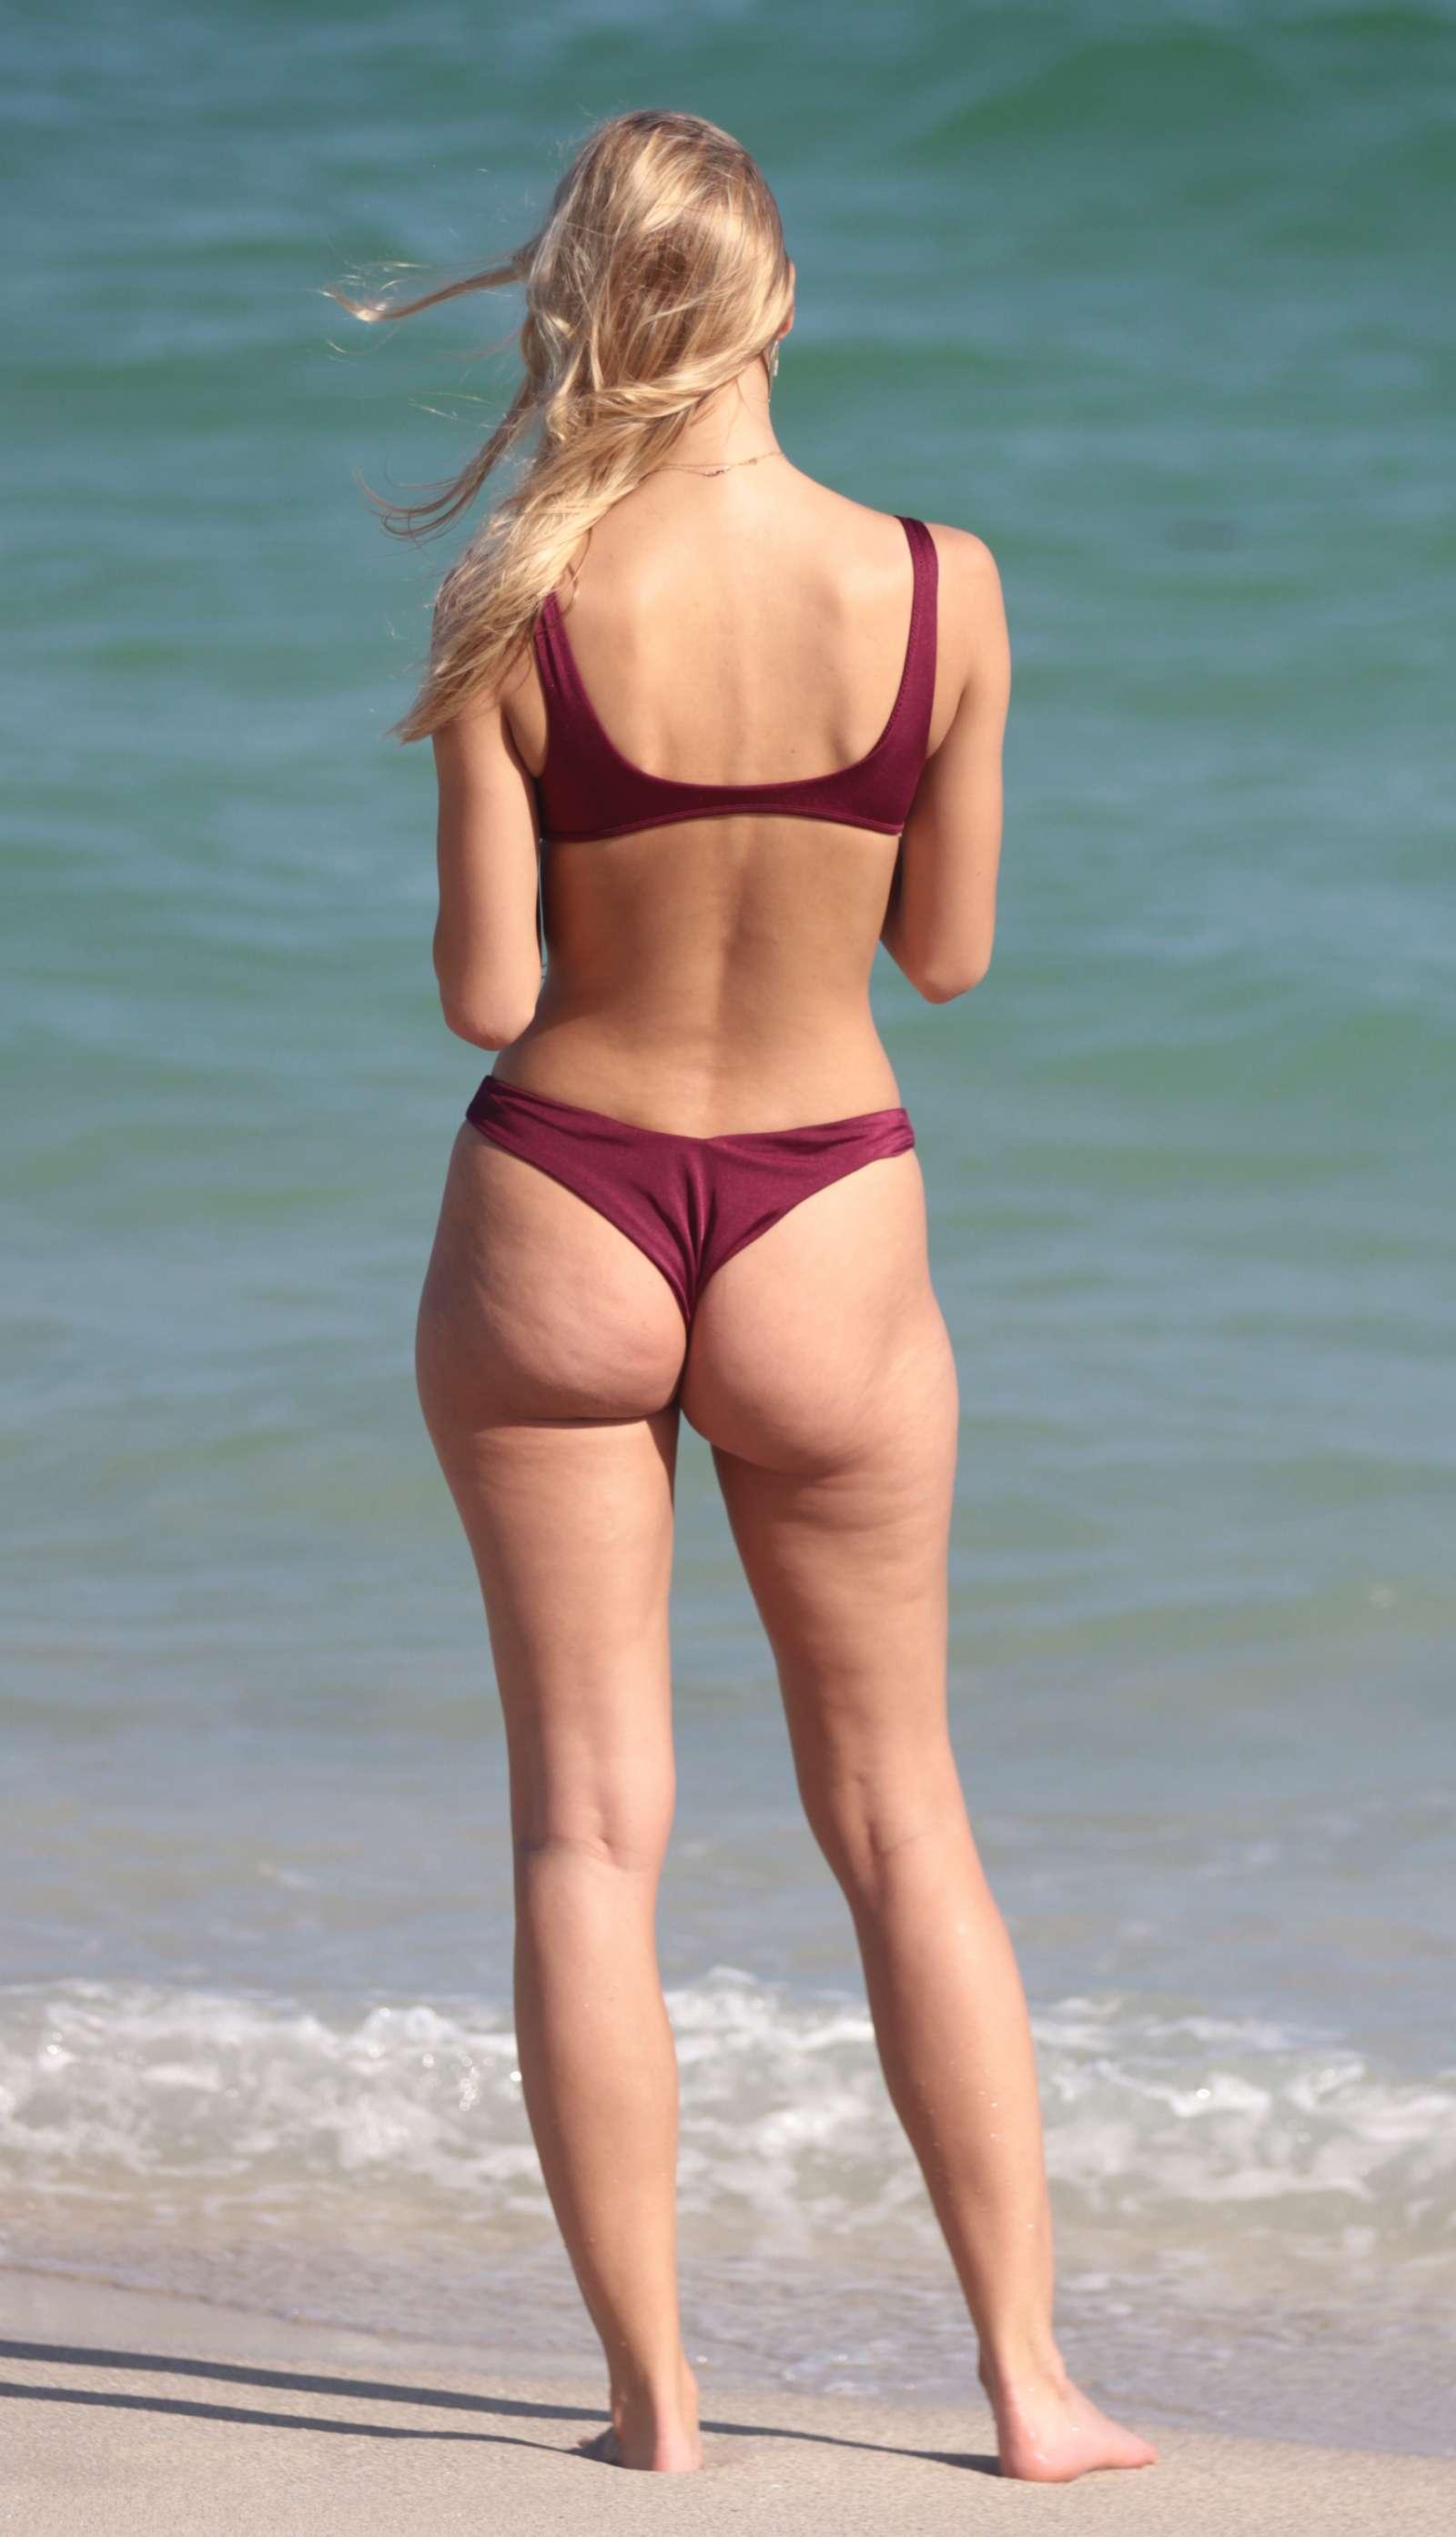 Mariya Melnyk in Bikini on the beach in Miami Beach Pic 10 of 35